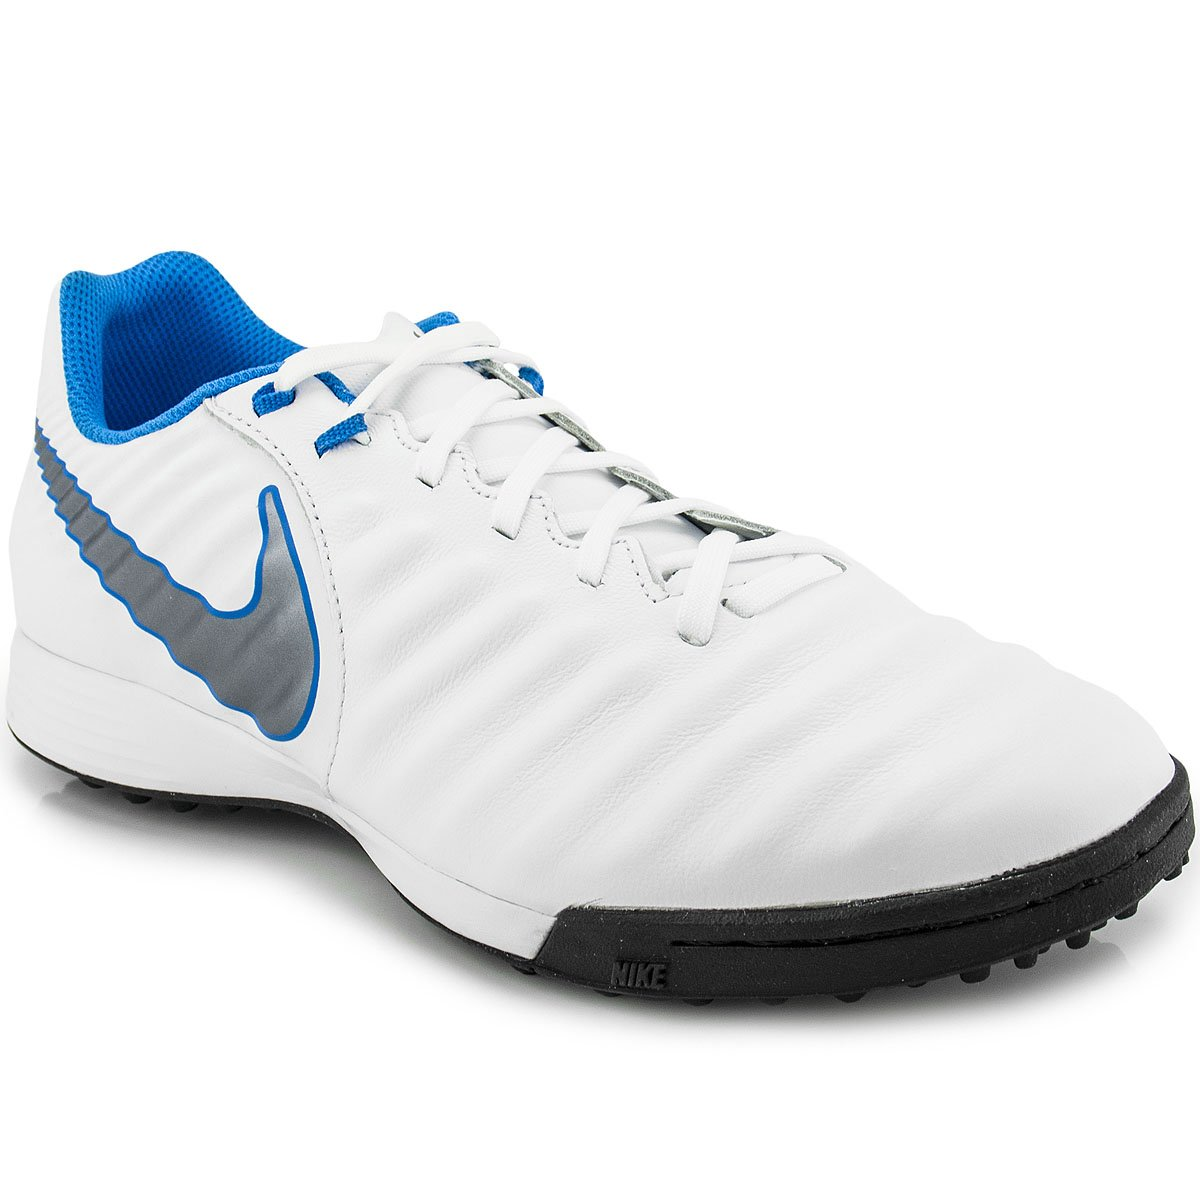 8f5b97a19b Chuteira Nike Tiempo Legendx 7 Academy TF